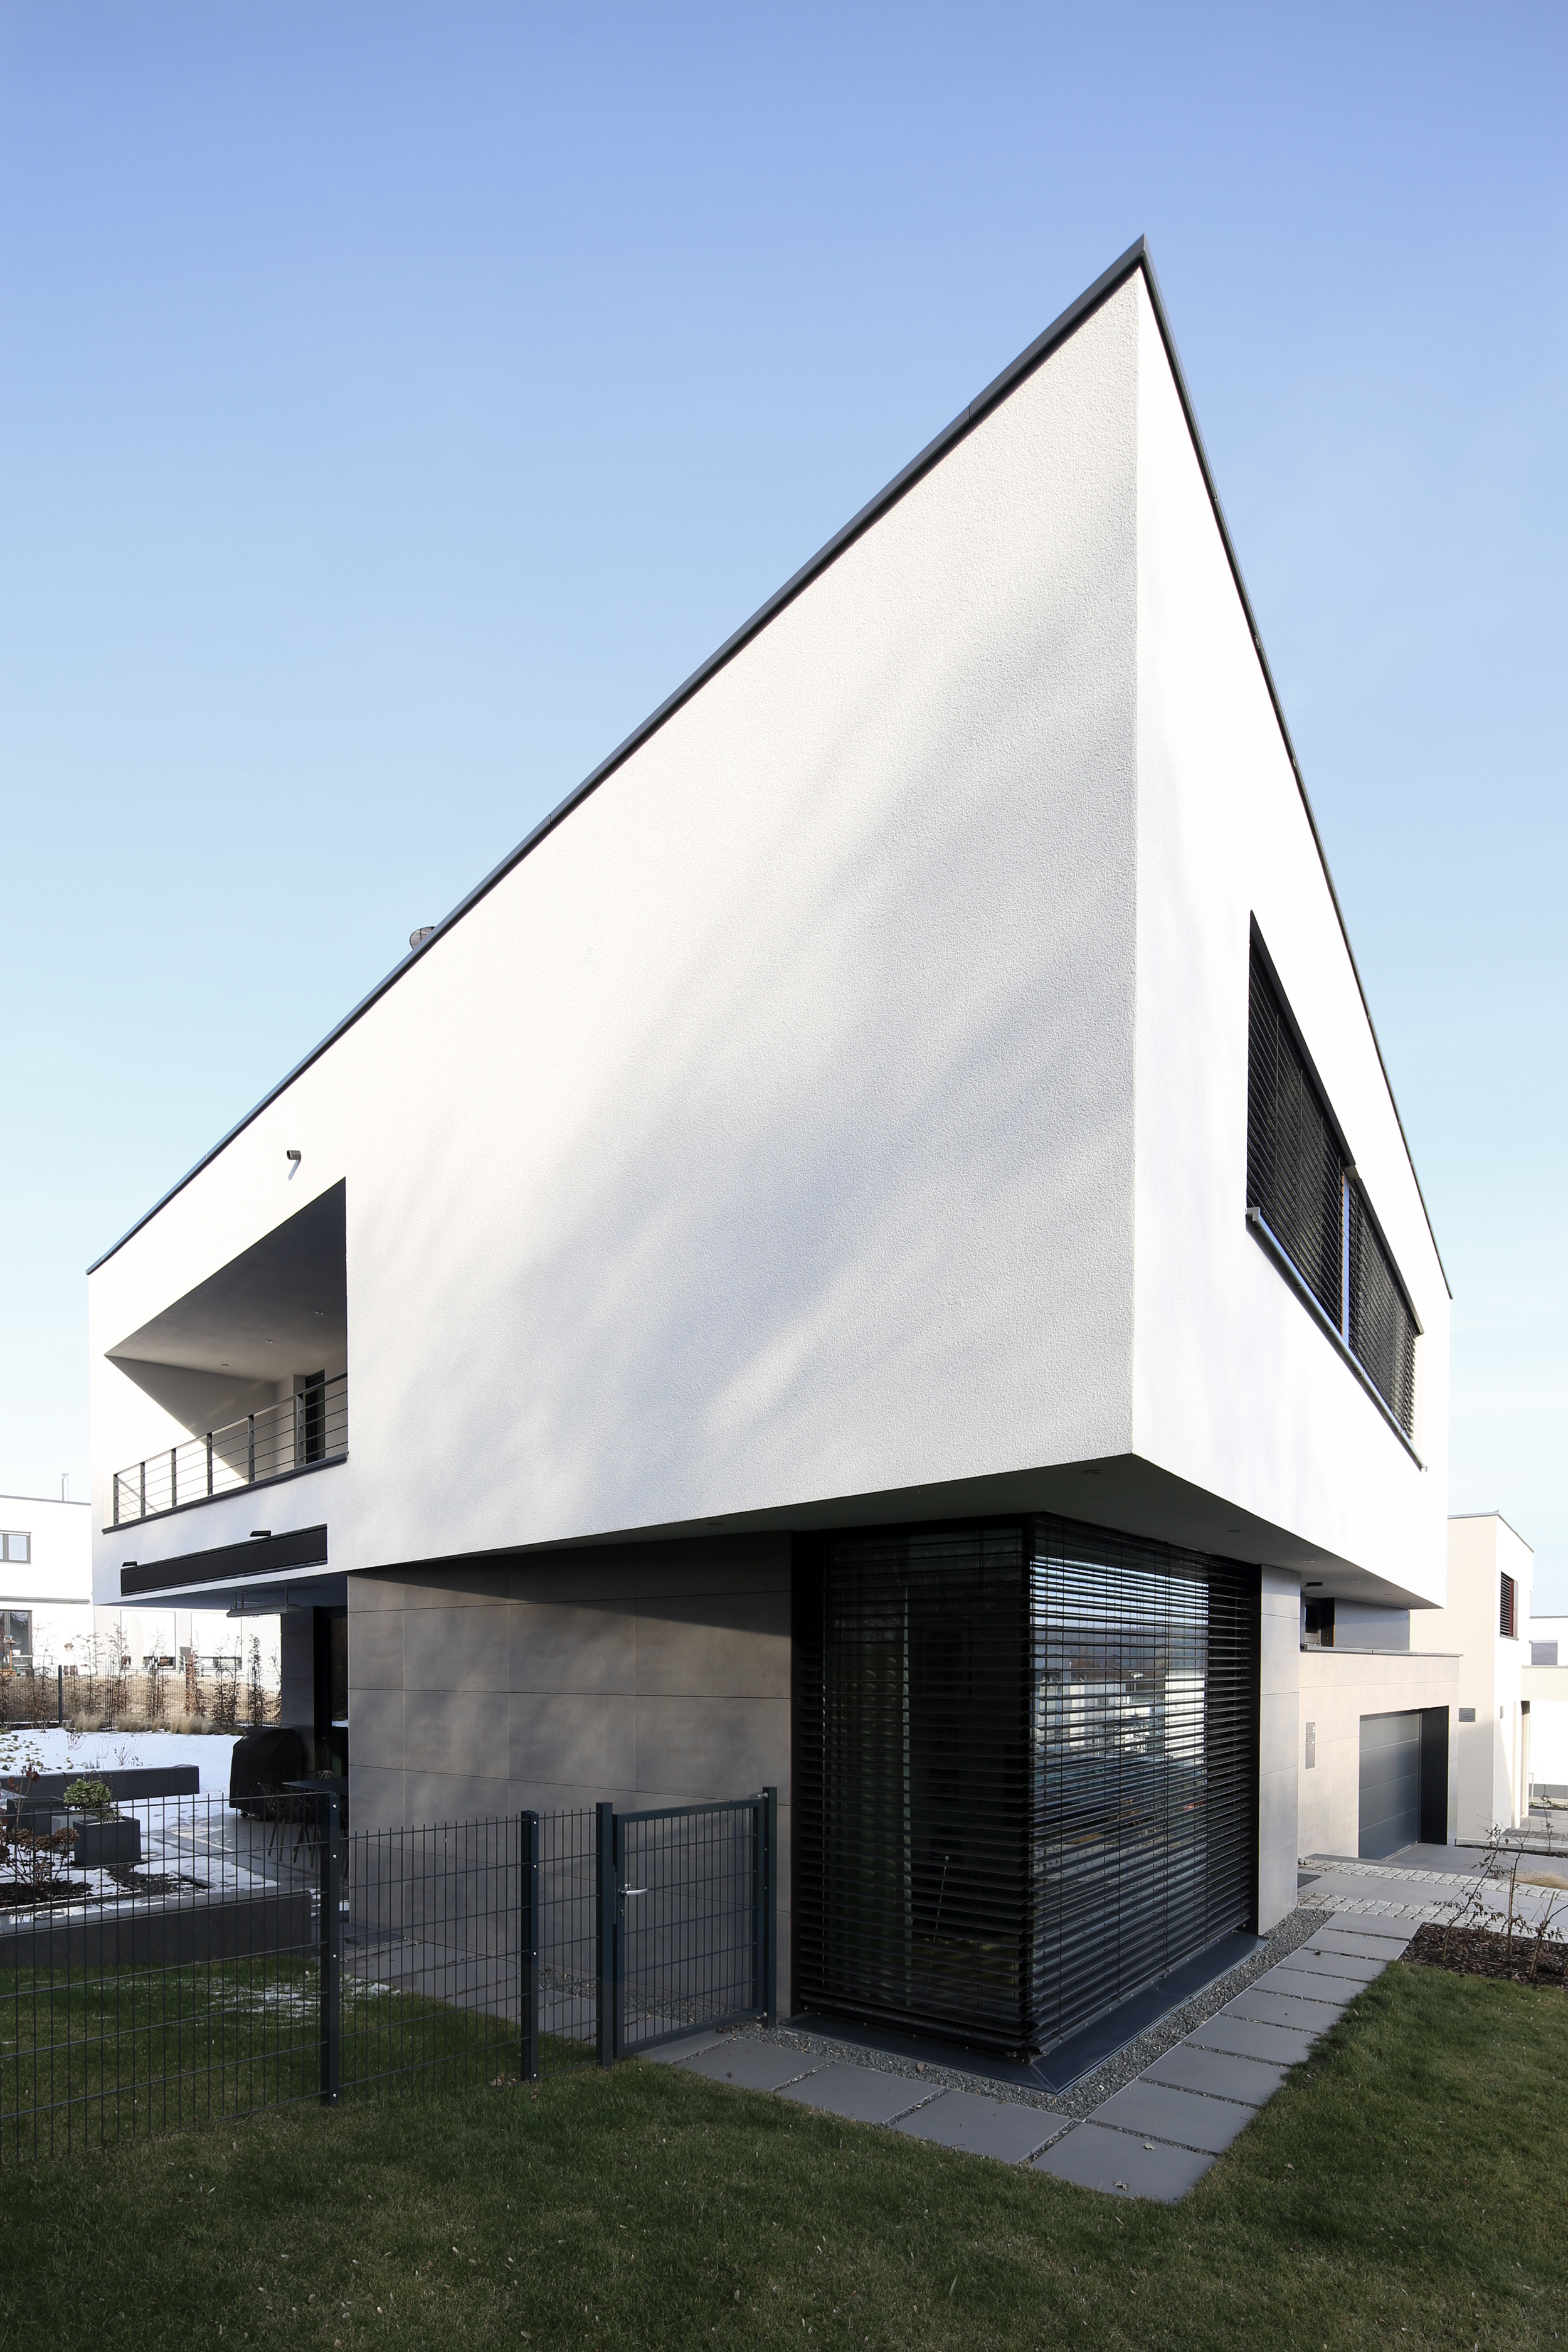 haus bruno erfurt architekturf hrer th ringen. Black Bedroom Furniture Sets. Home Design Ideas